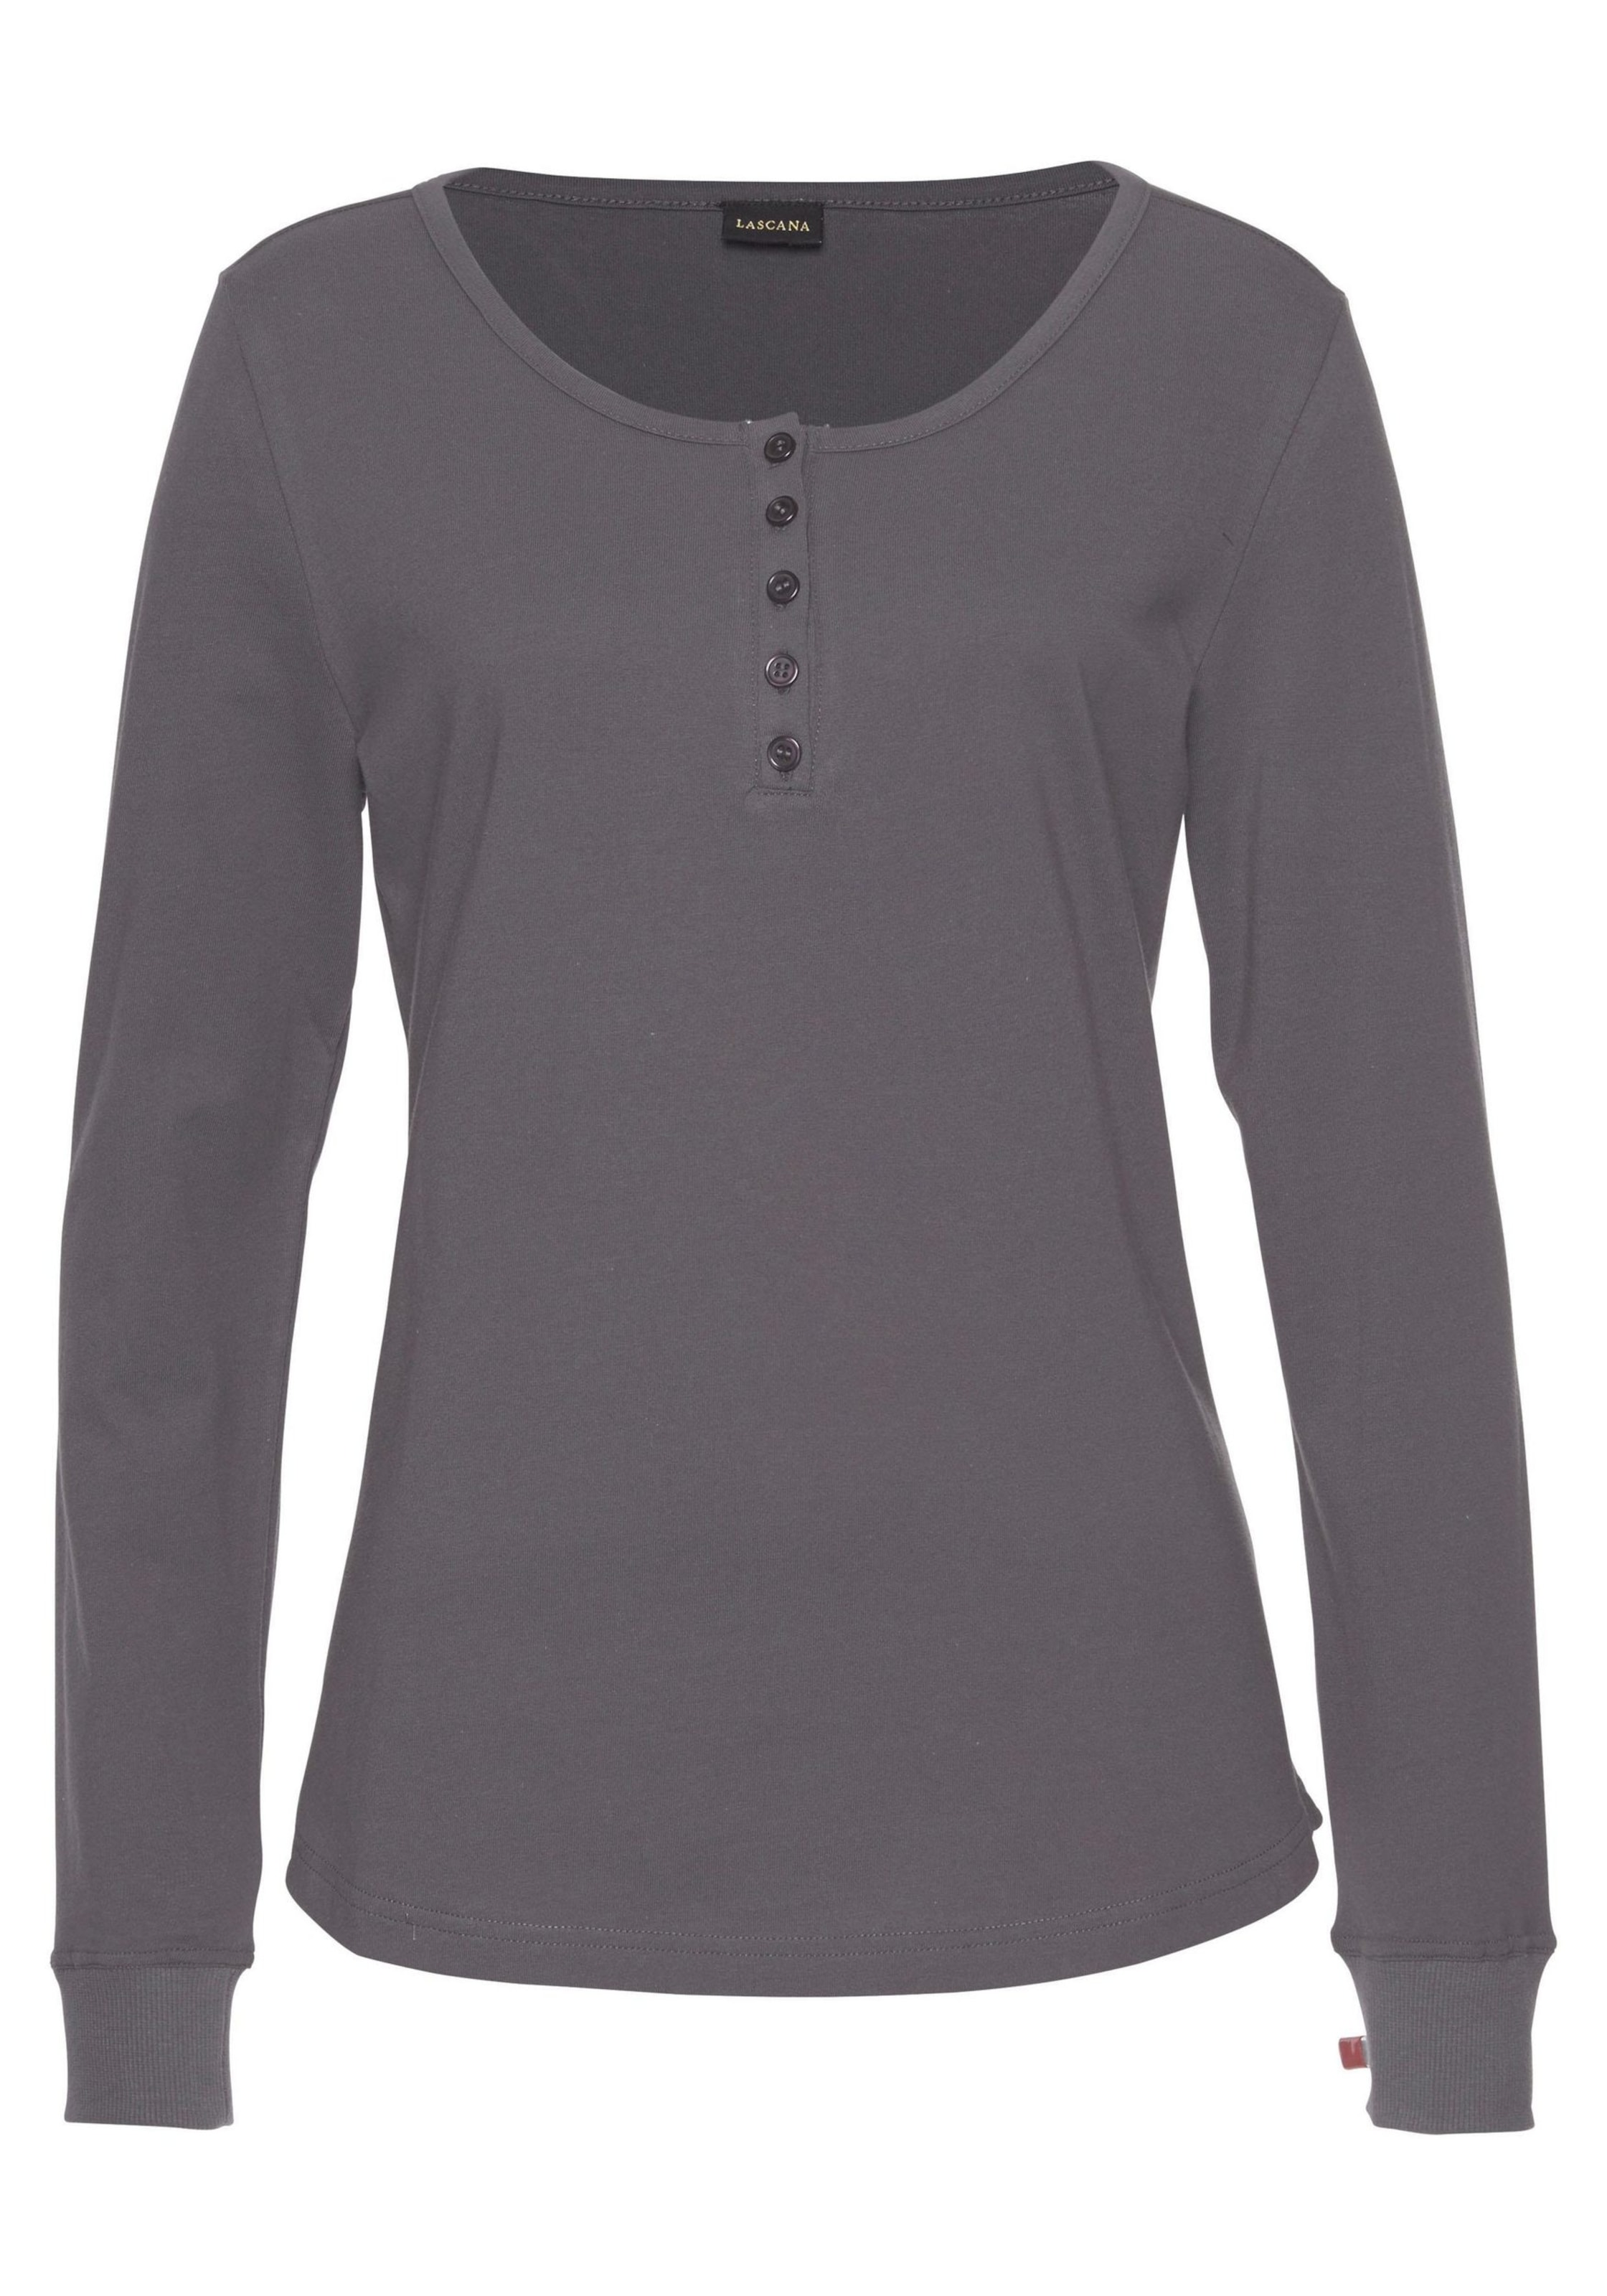 Shirt In In Dunkelgrau Lascana Dunkelgrau Lascana Shirt Lascana yvNn08POmw